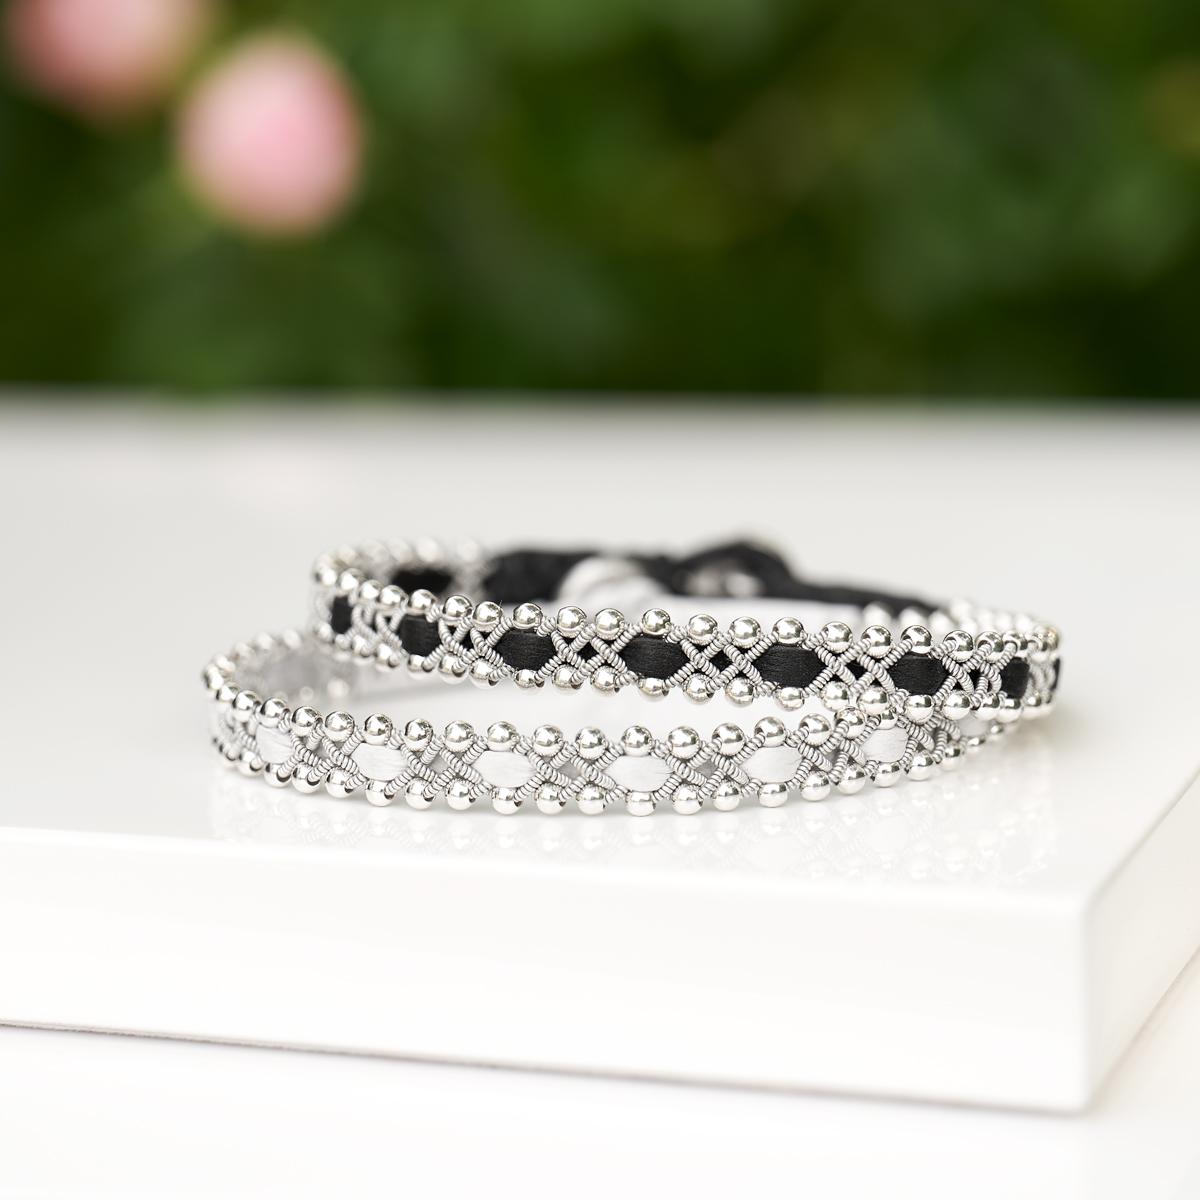 tenntrådsarmband nordic jewelry design